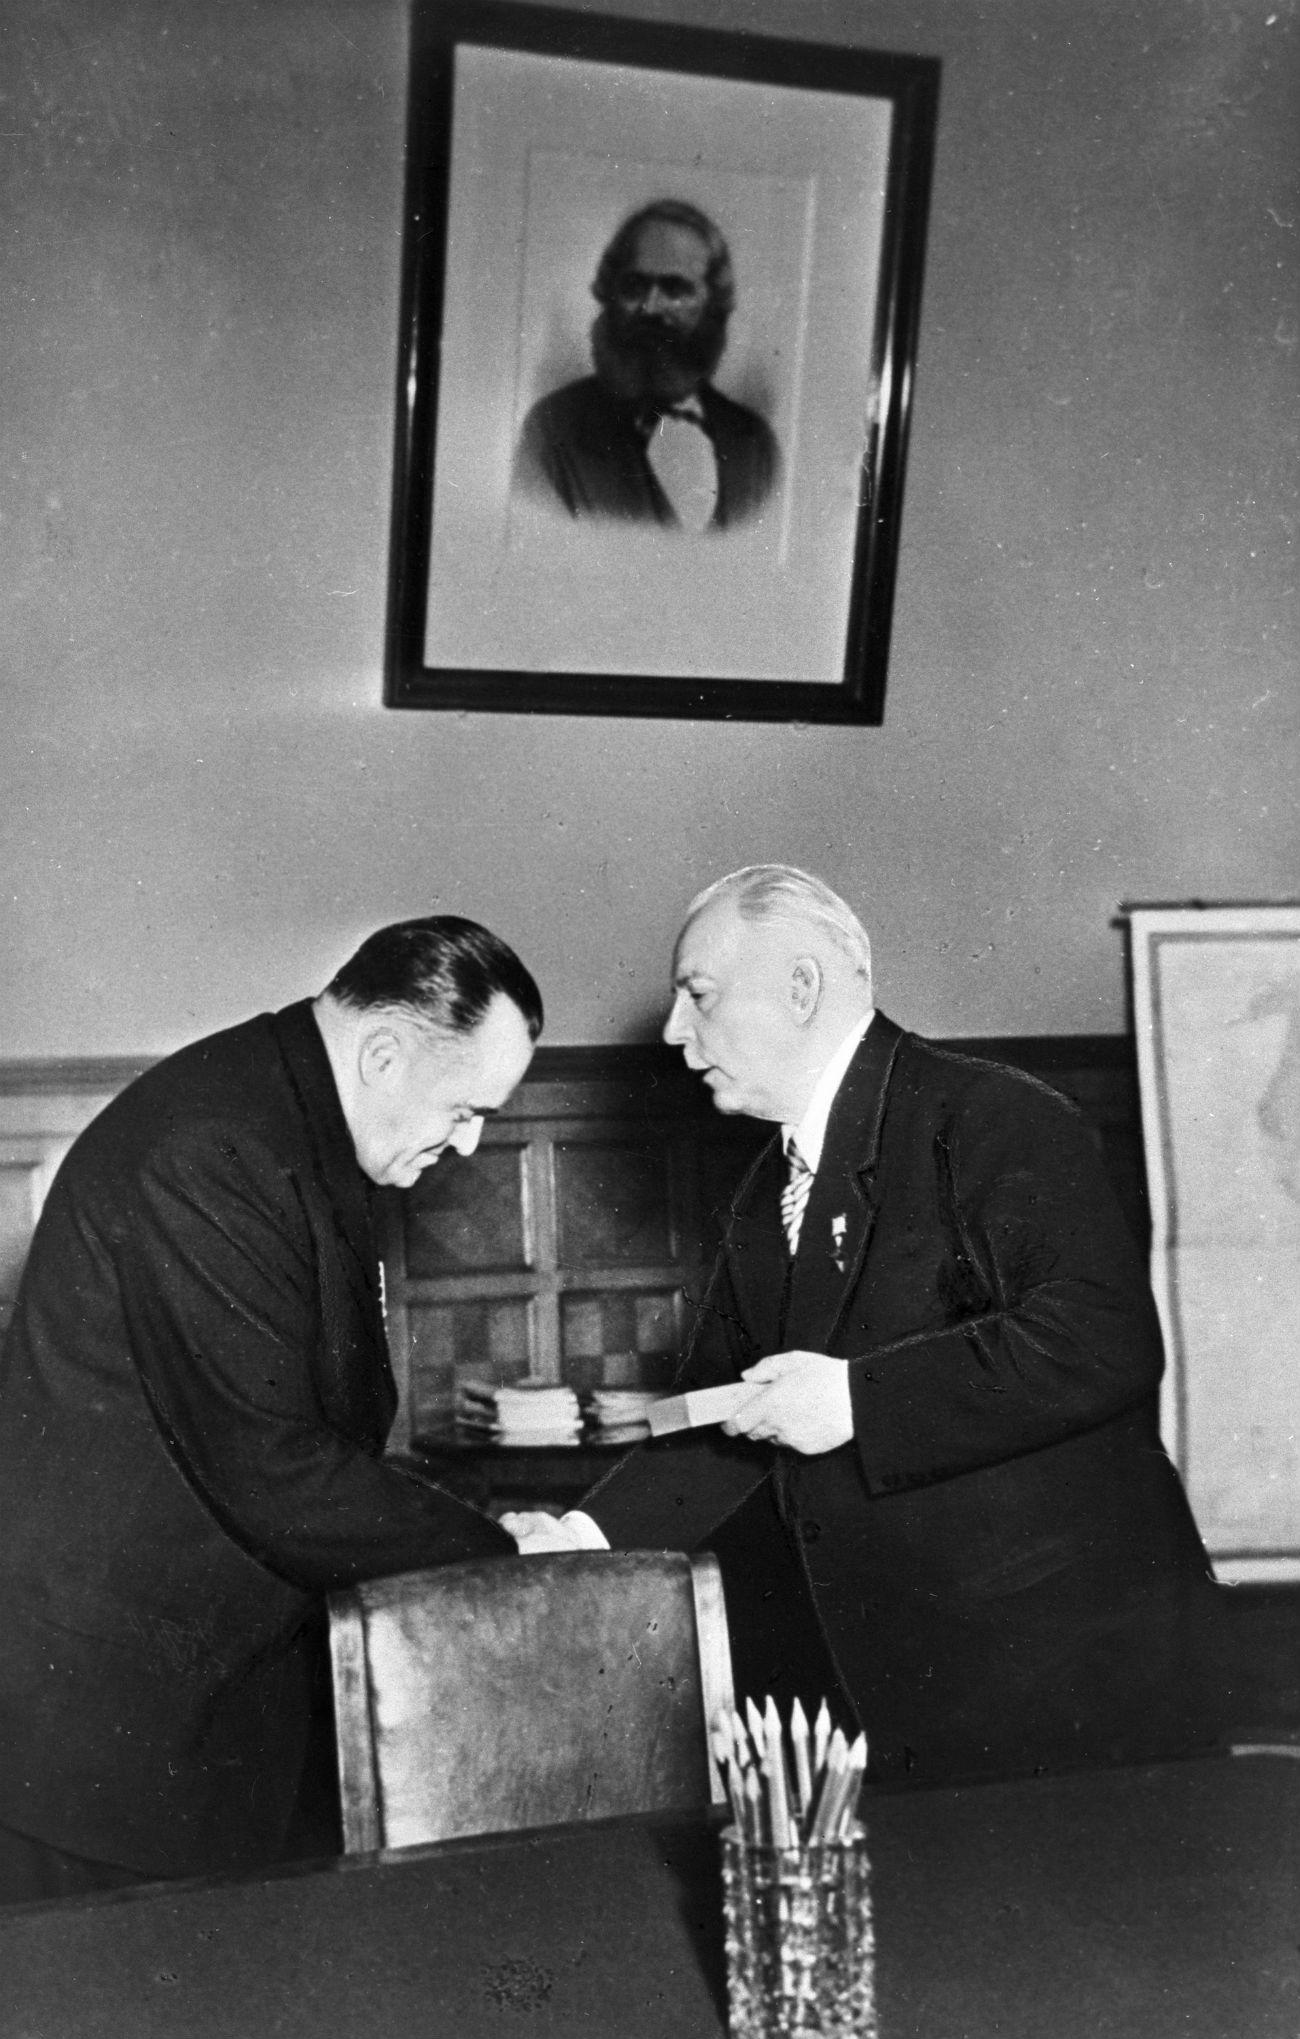 Kliment Vorošilov nagrađuje Koroljova ordenom Lenjina, 1968. / RIA Novosti